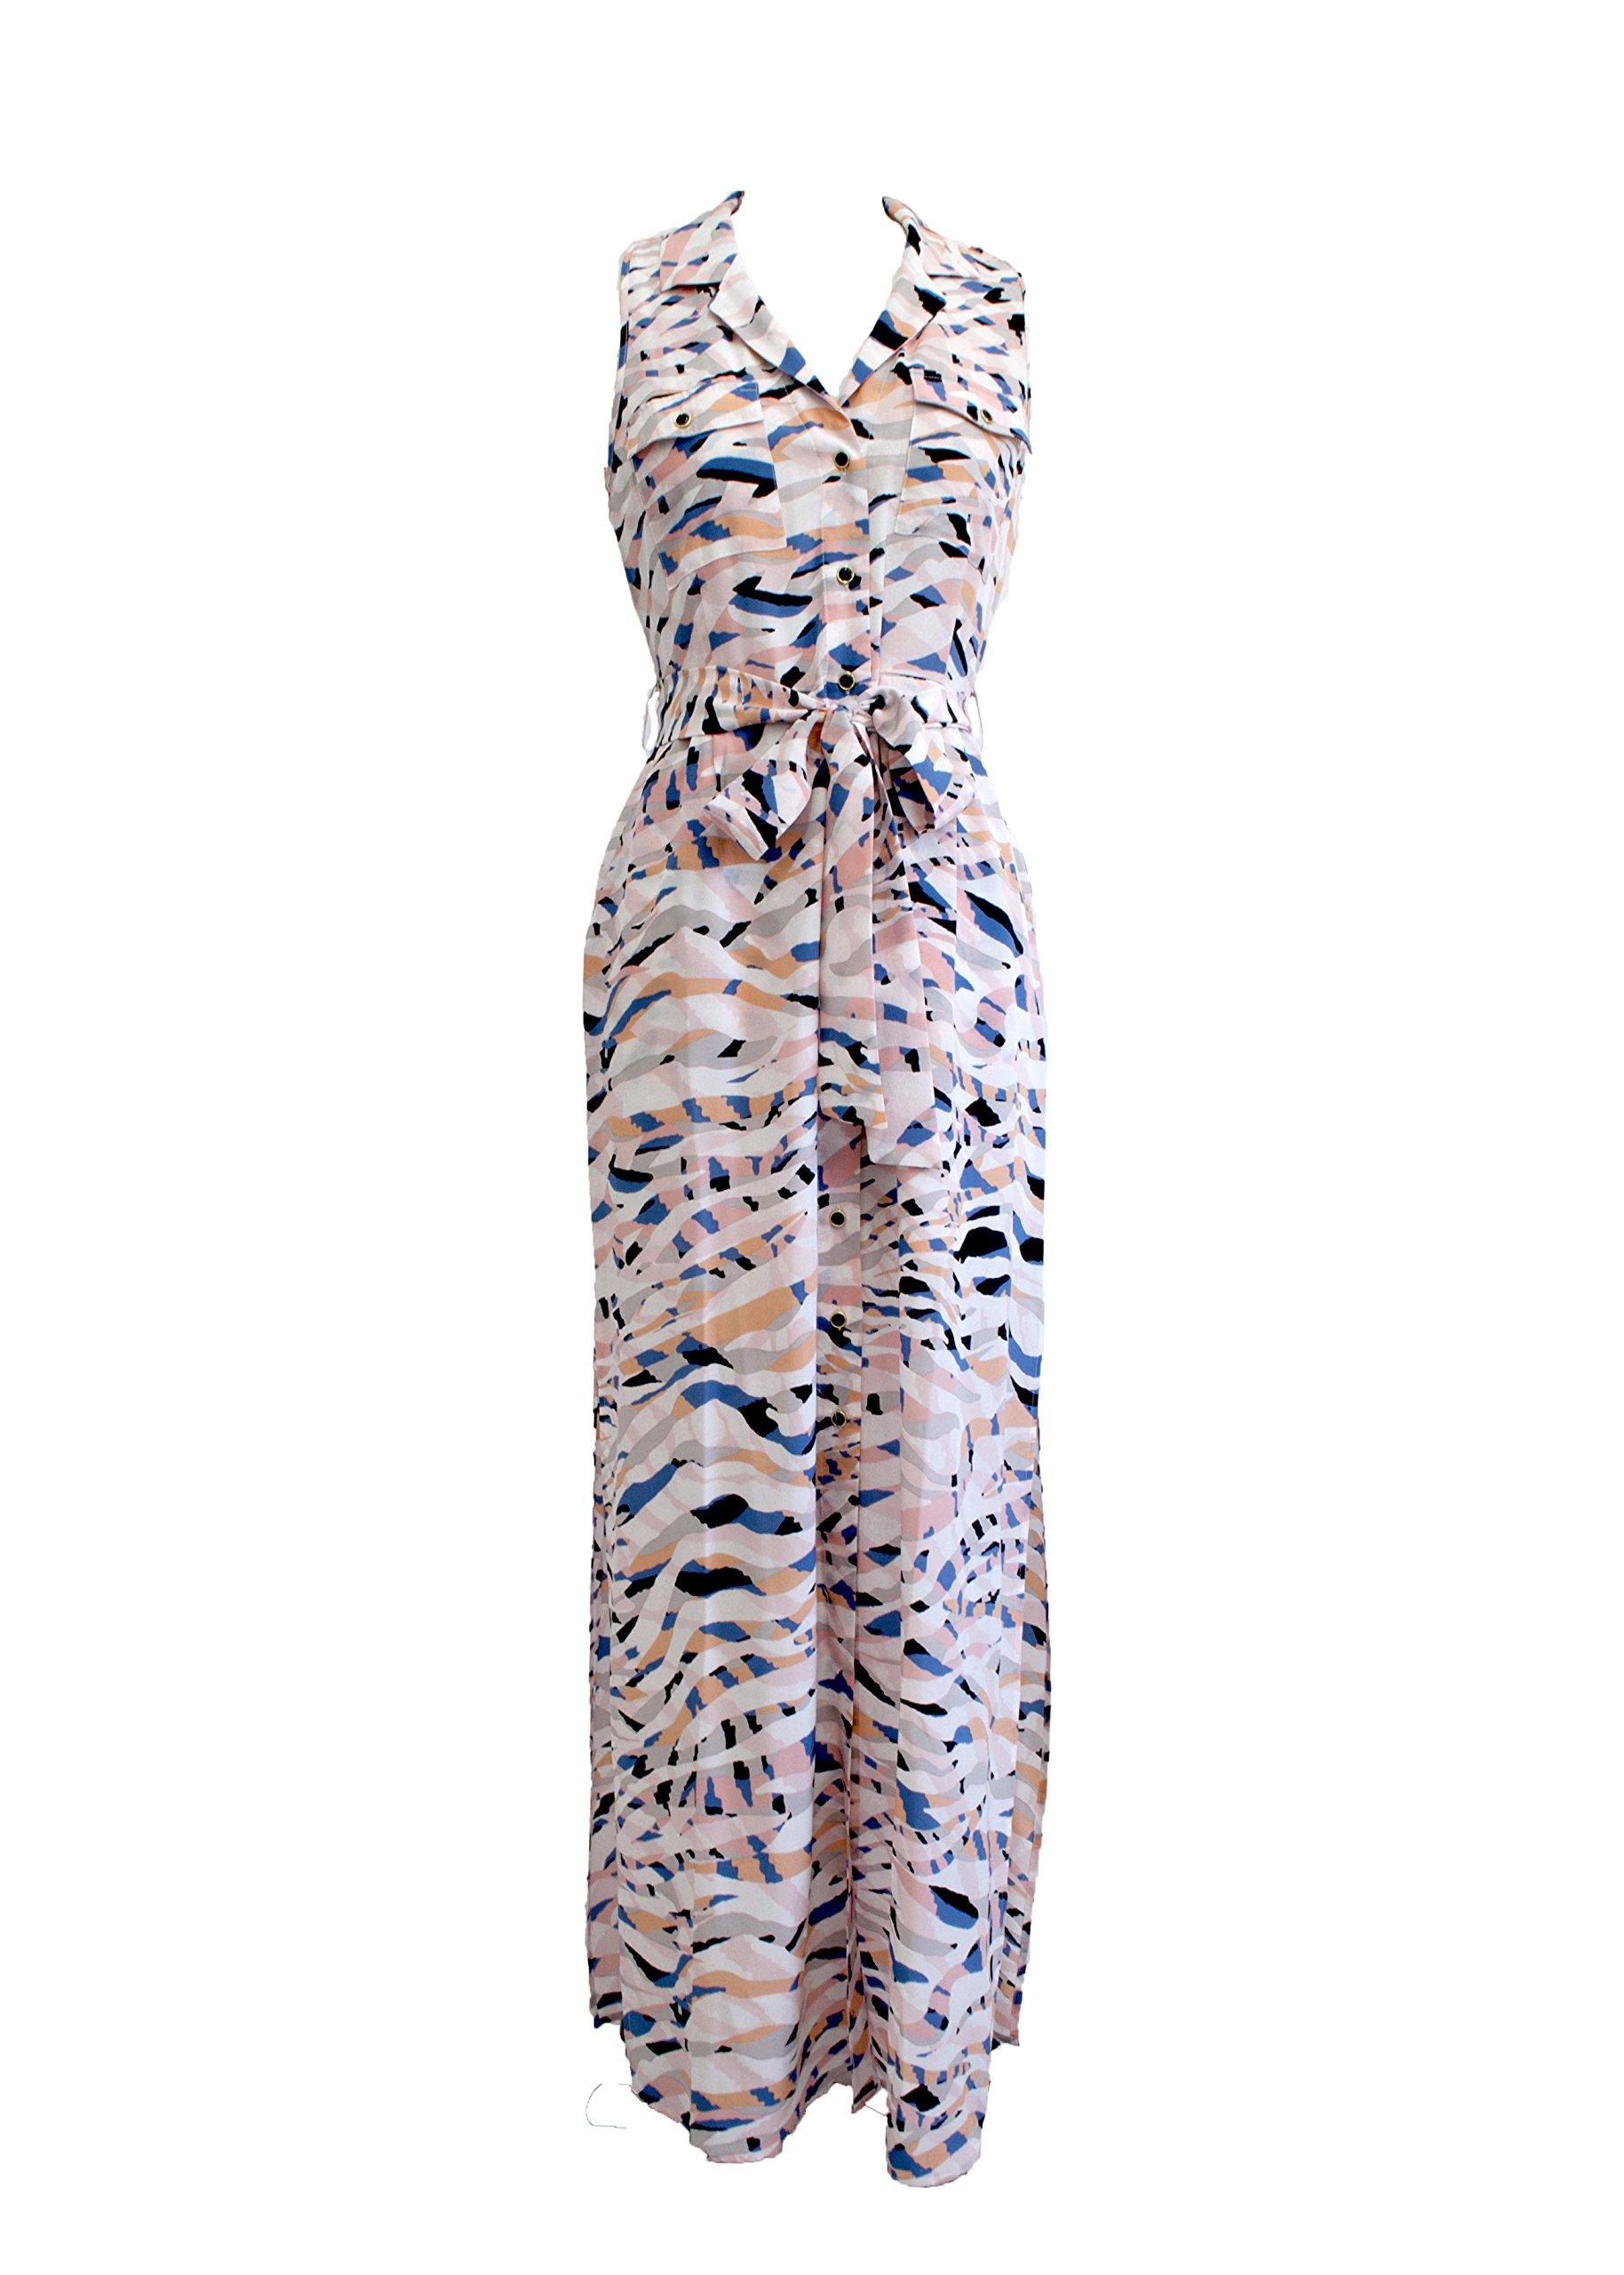 YUMI KIM Silk Button Through Maxi Side Slit Dress Hypnotize Print Small by Yumi Kim